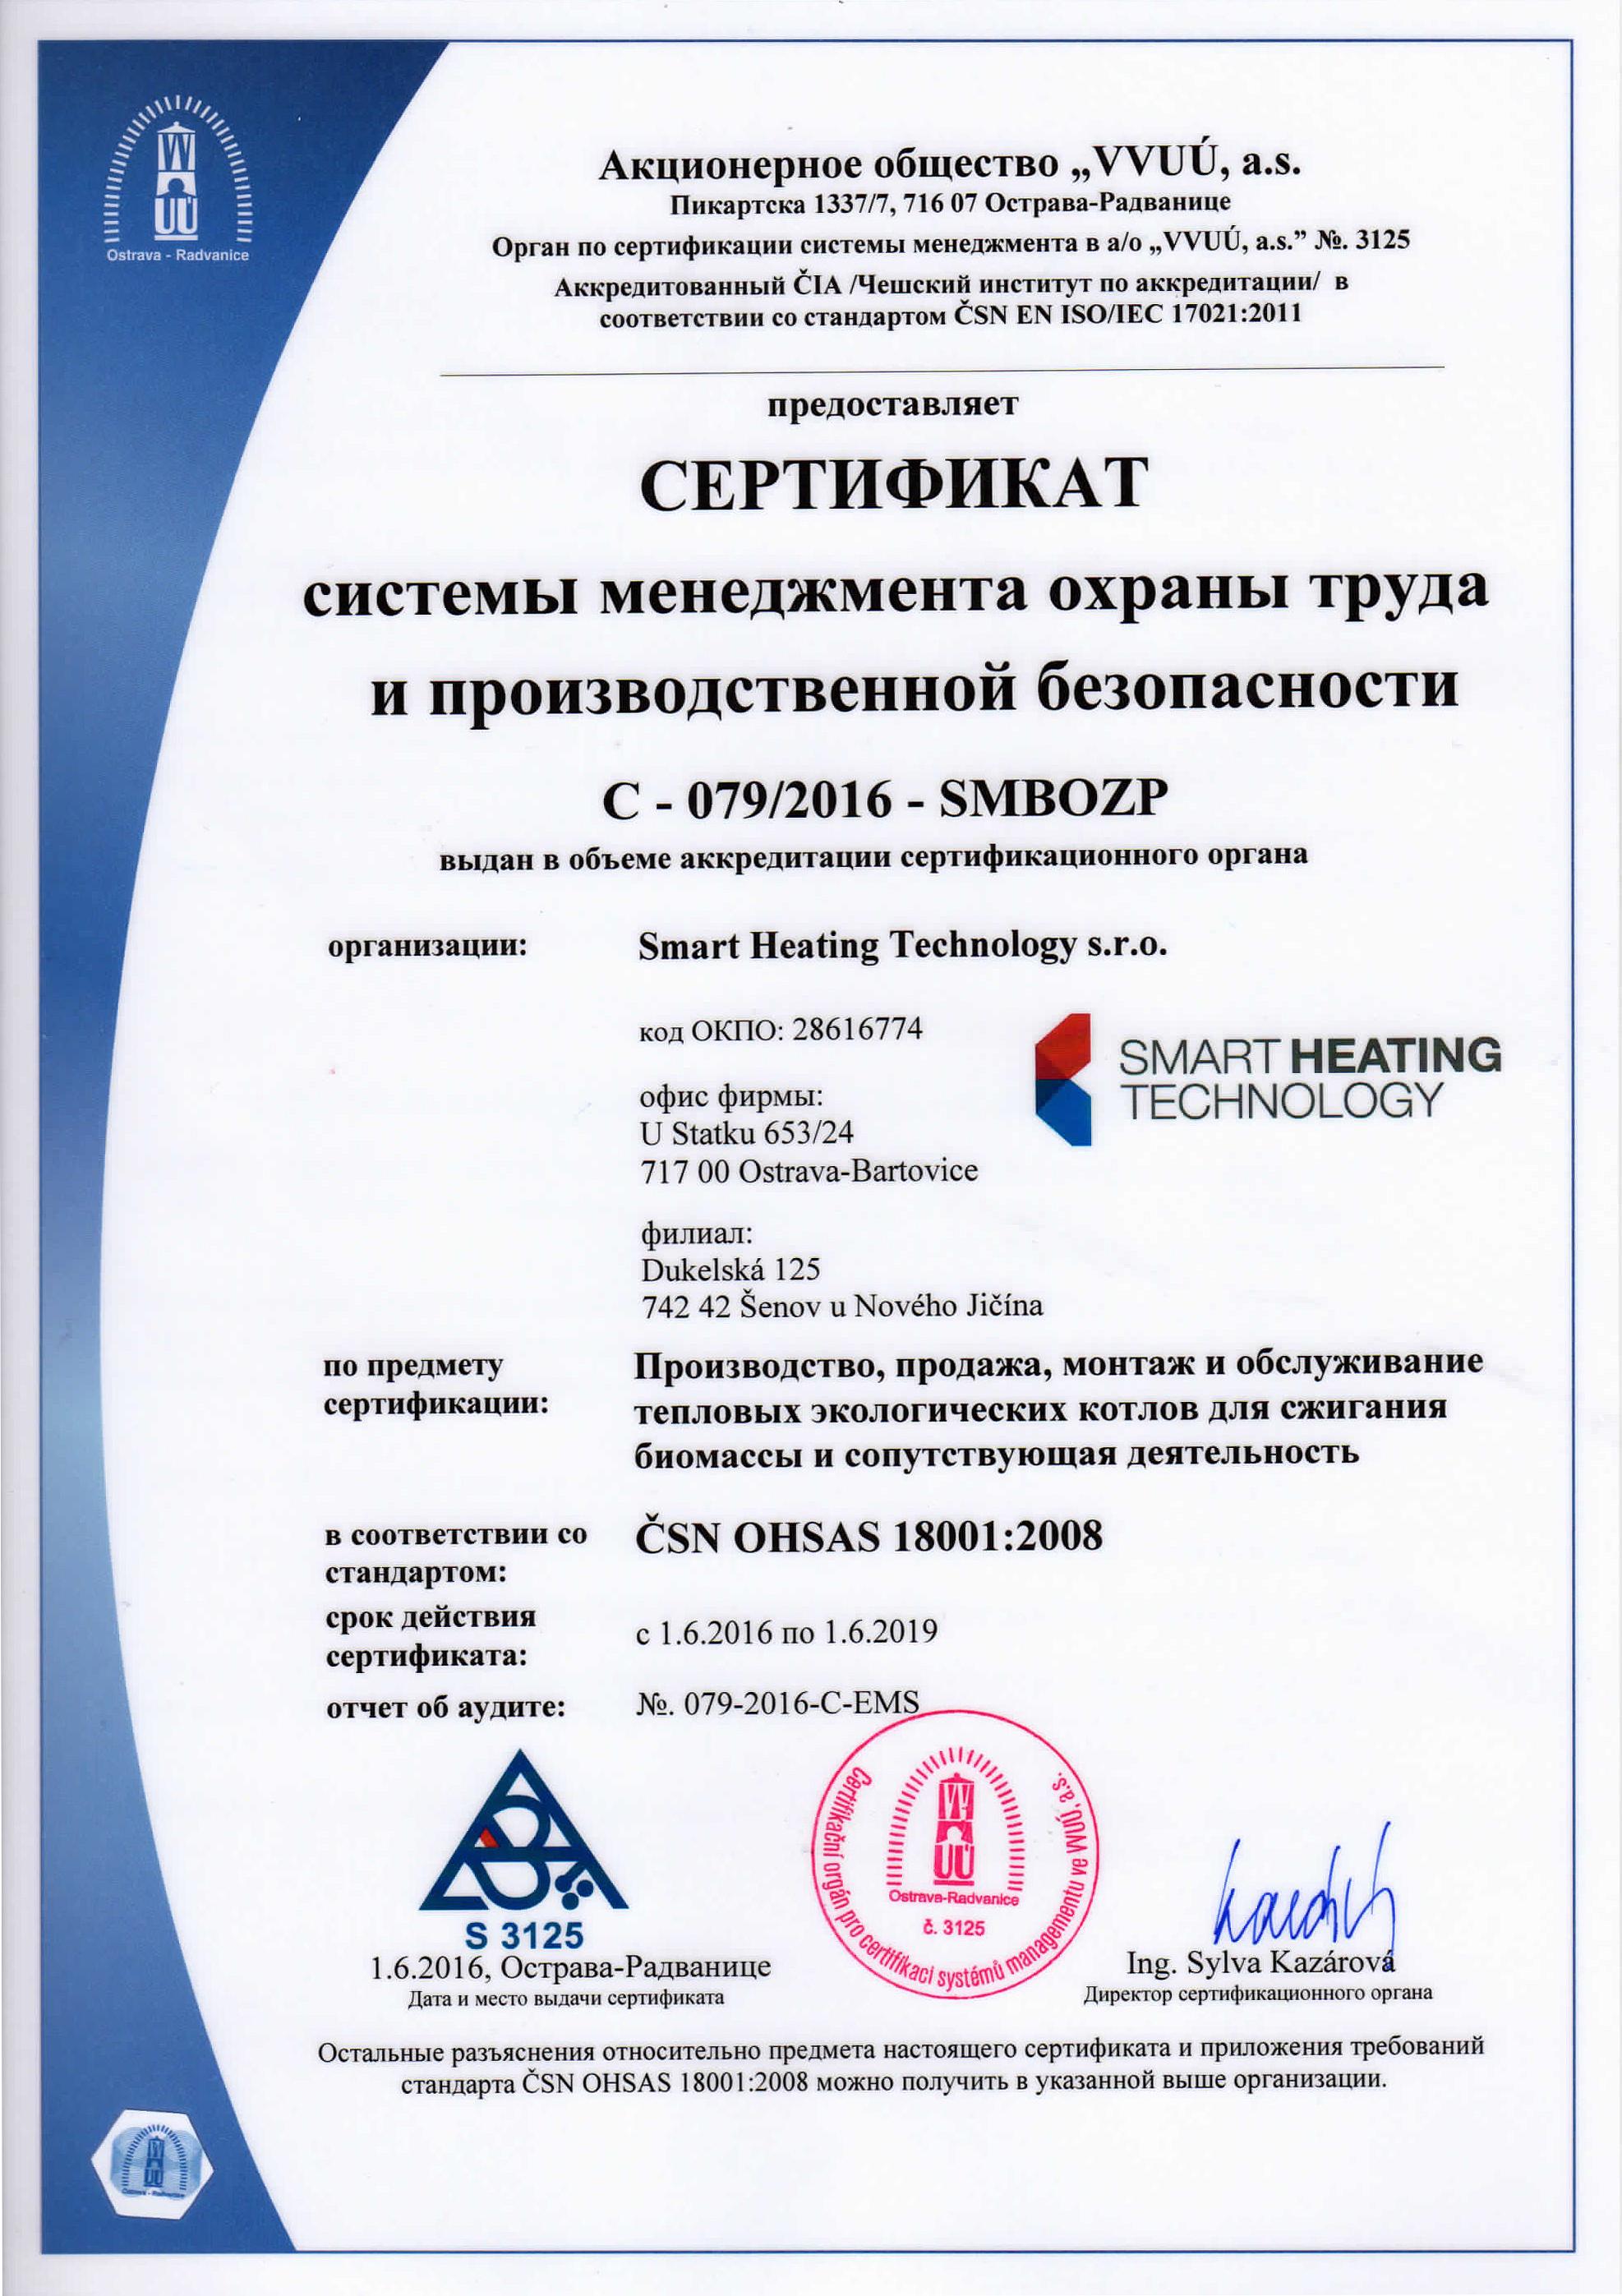 certifikat-c-079_2016-smbozp-ru